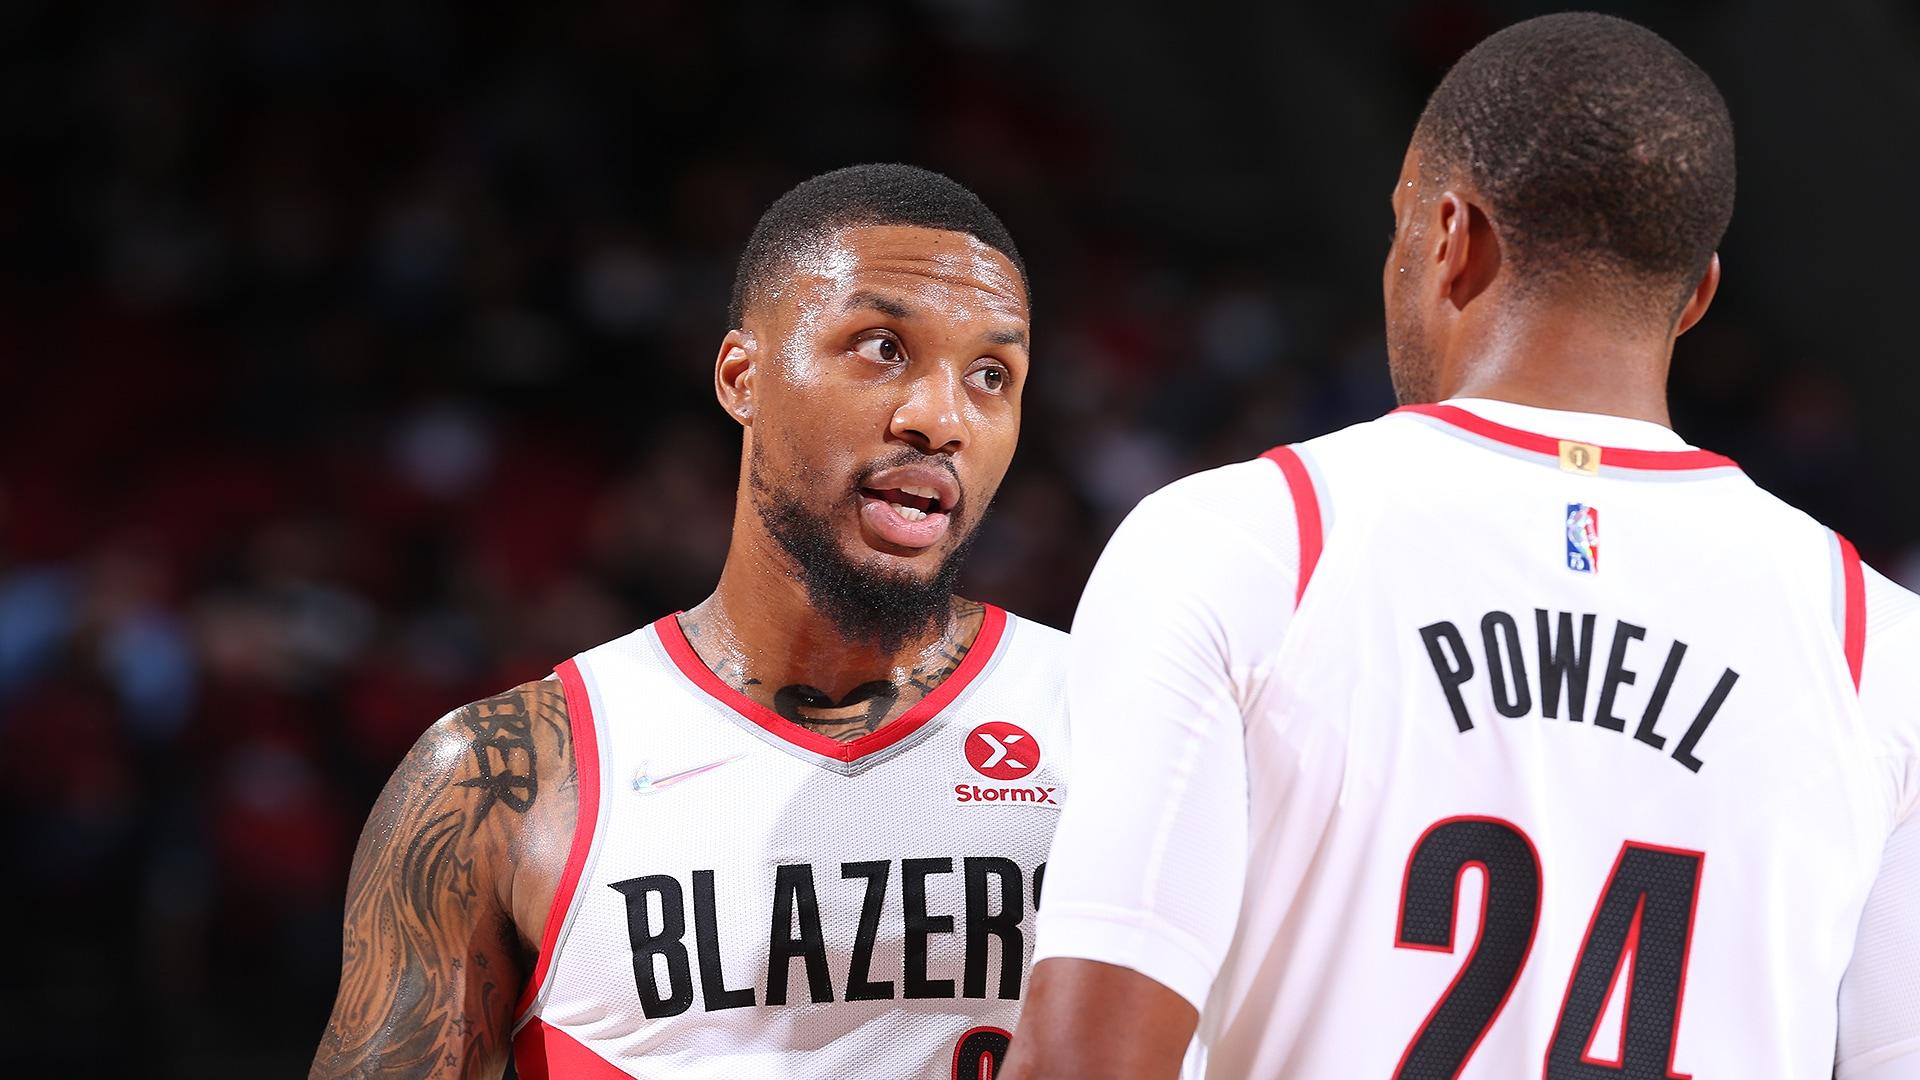 Blazers' hopes for success hinge on defense